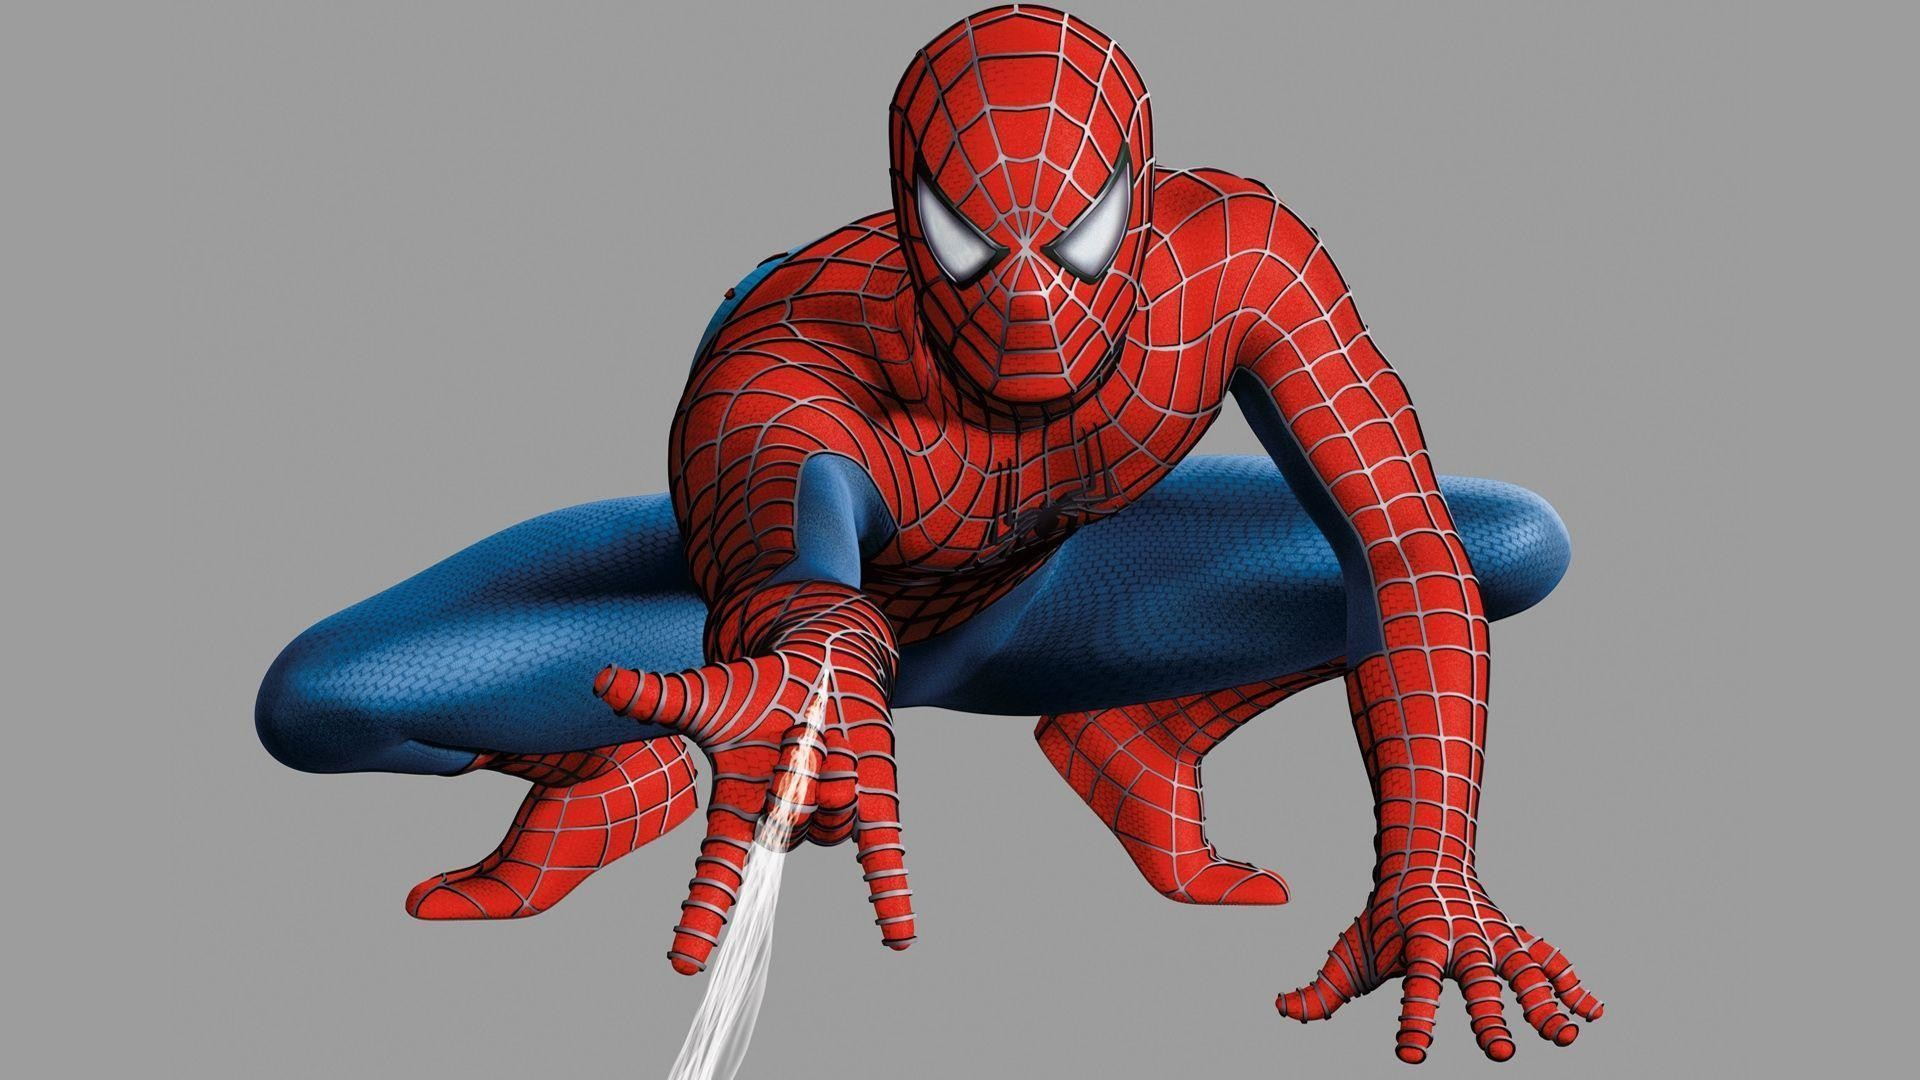 Spiderman 4 Wallpaper (65+ Images